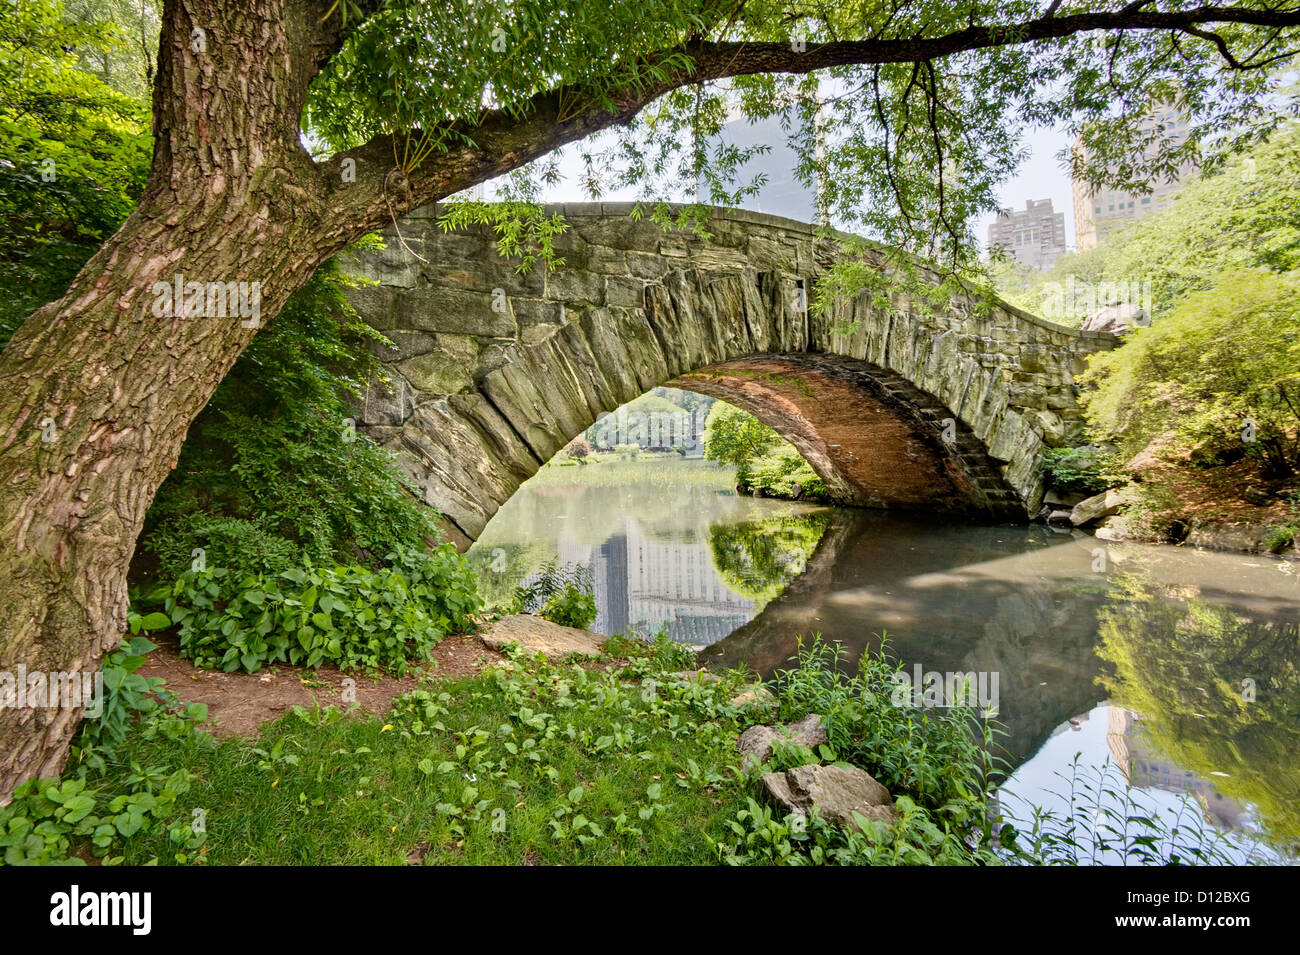 A stone bridge, Gapstow Bridge, in Central Park, NY. - Stock Image